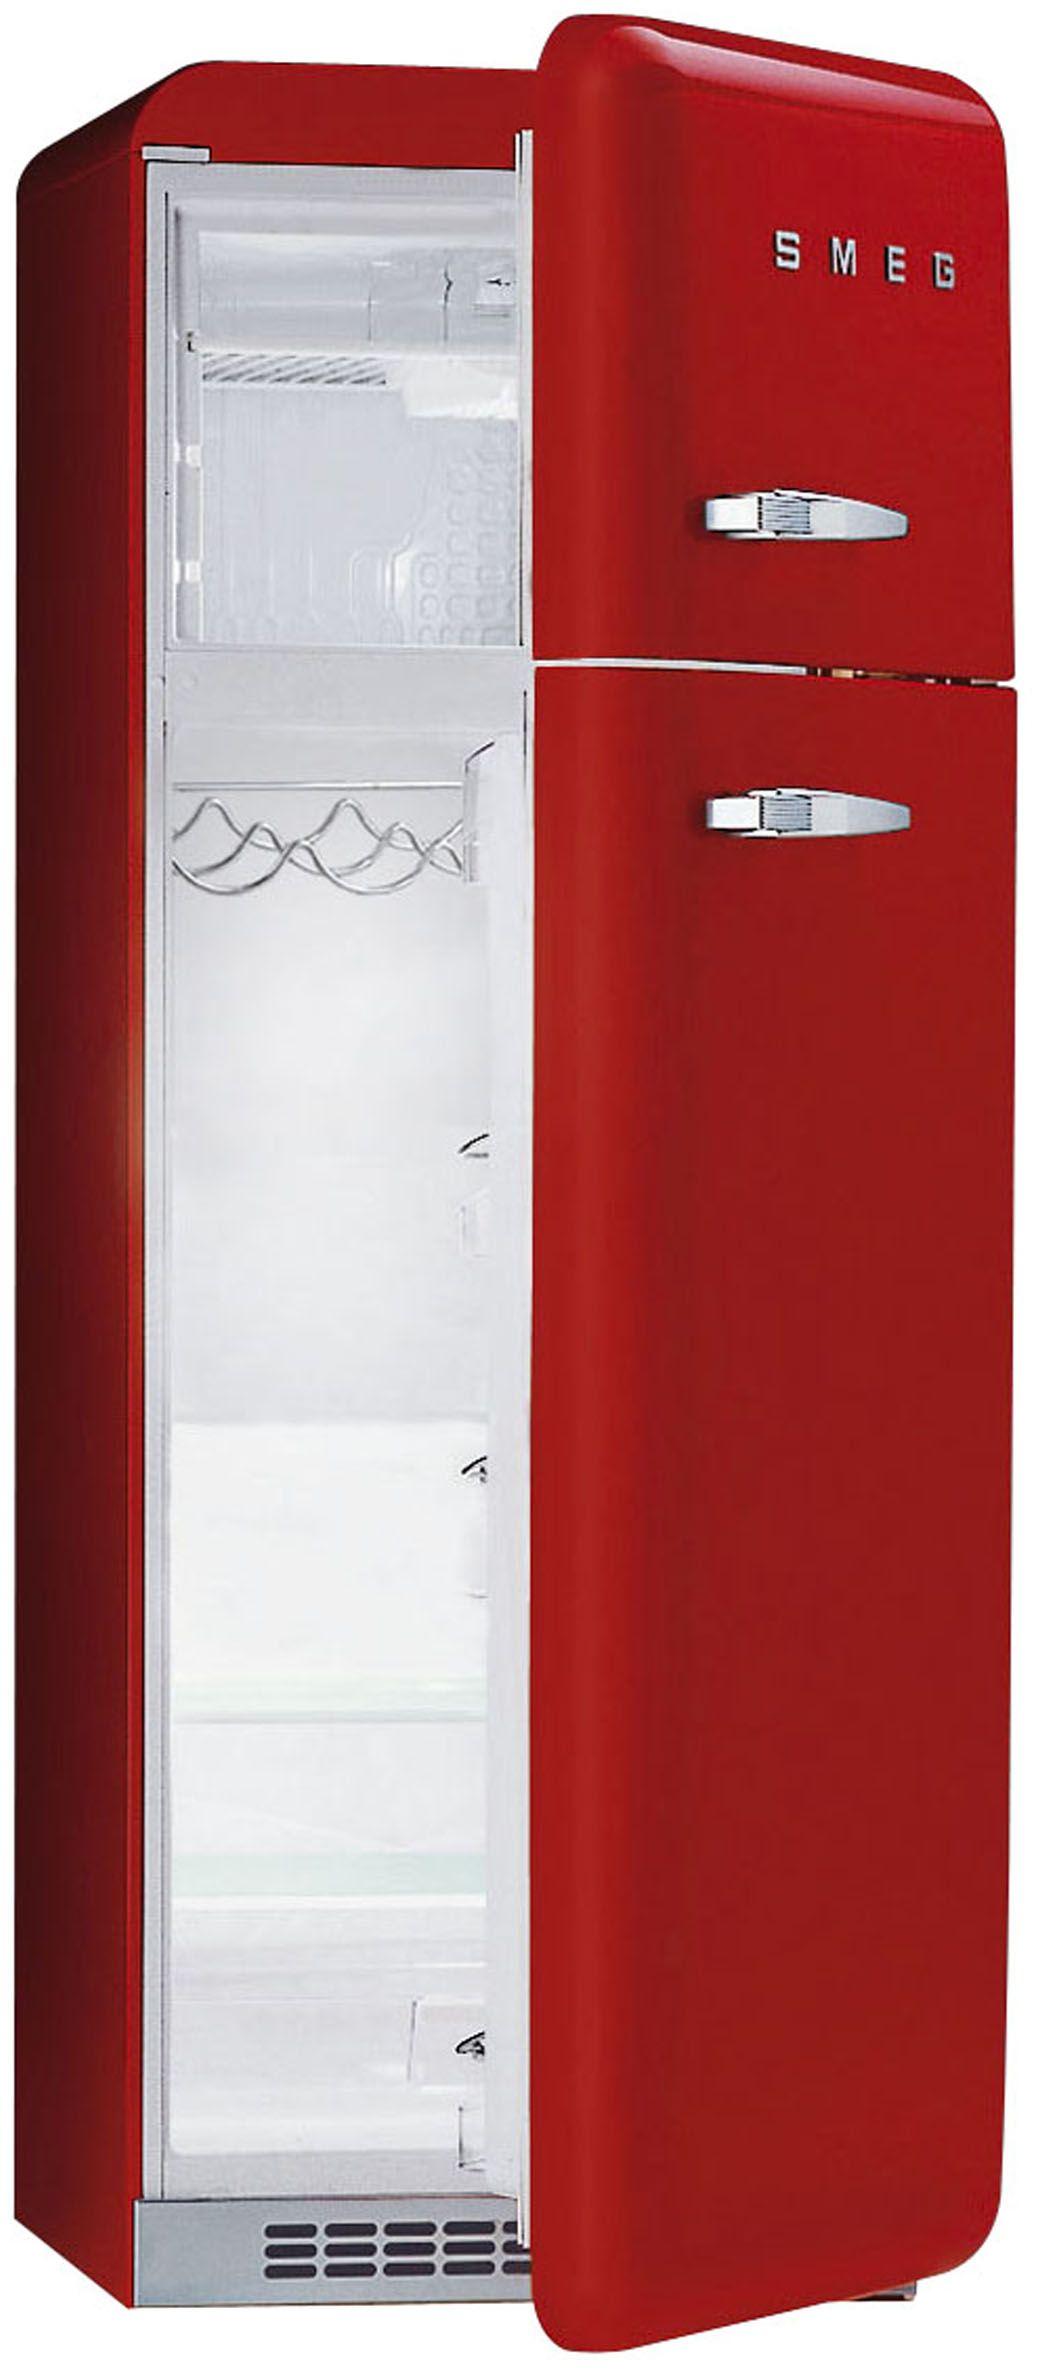 Ao Com Washing Machines Freezers Cookers Tvs More Appliances Online Smeg Fridge Retro Fridge Freezer